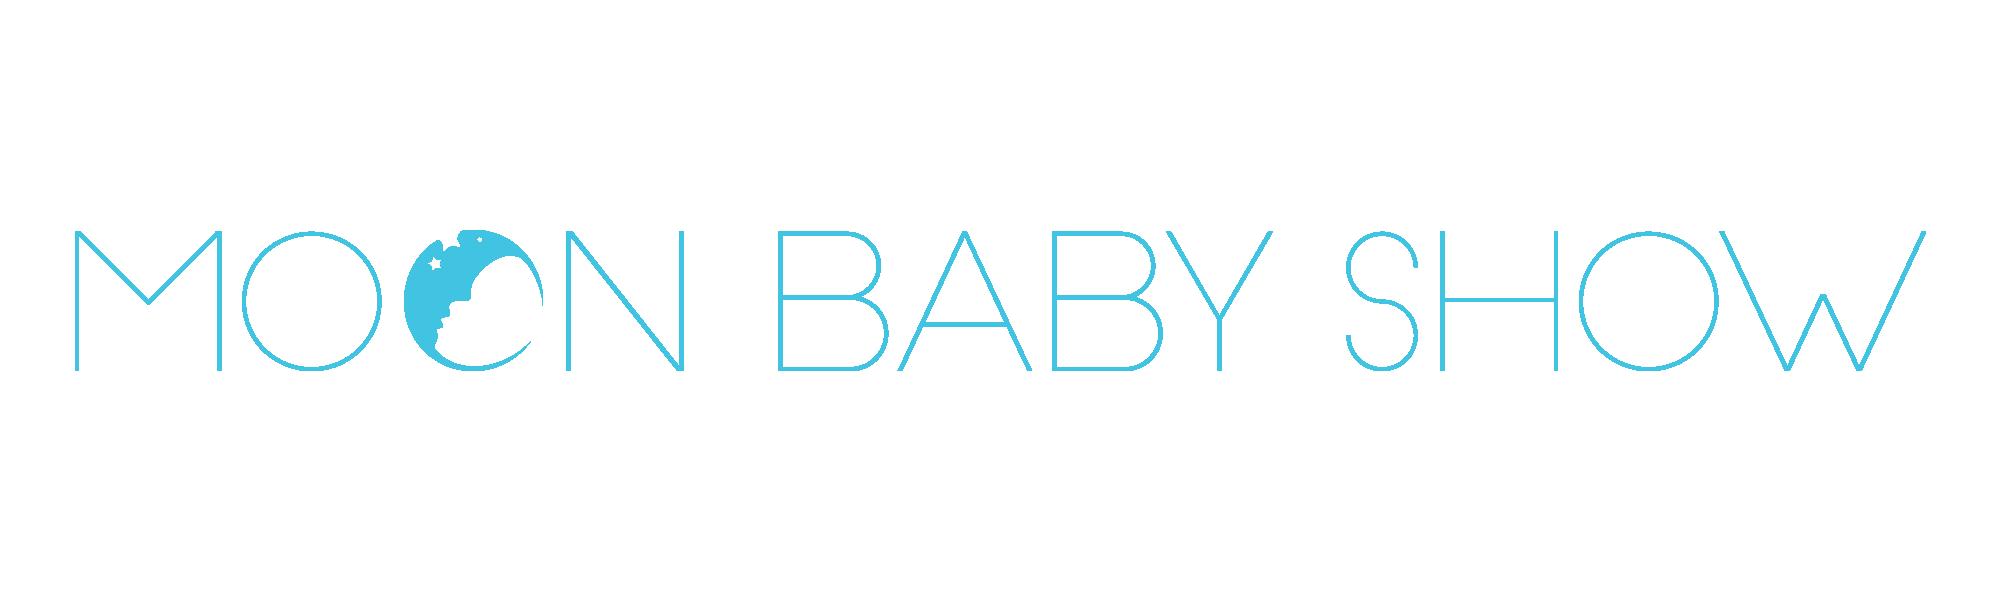 logo the moon baby show